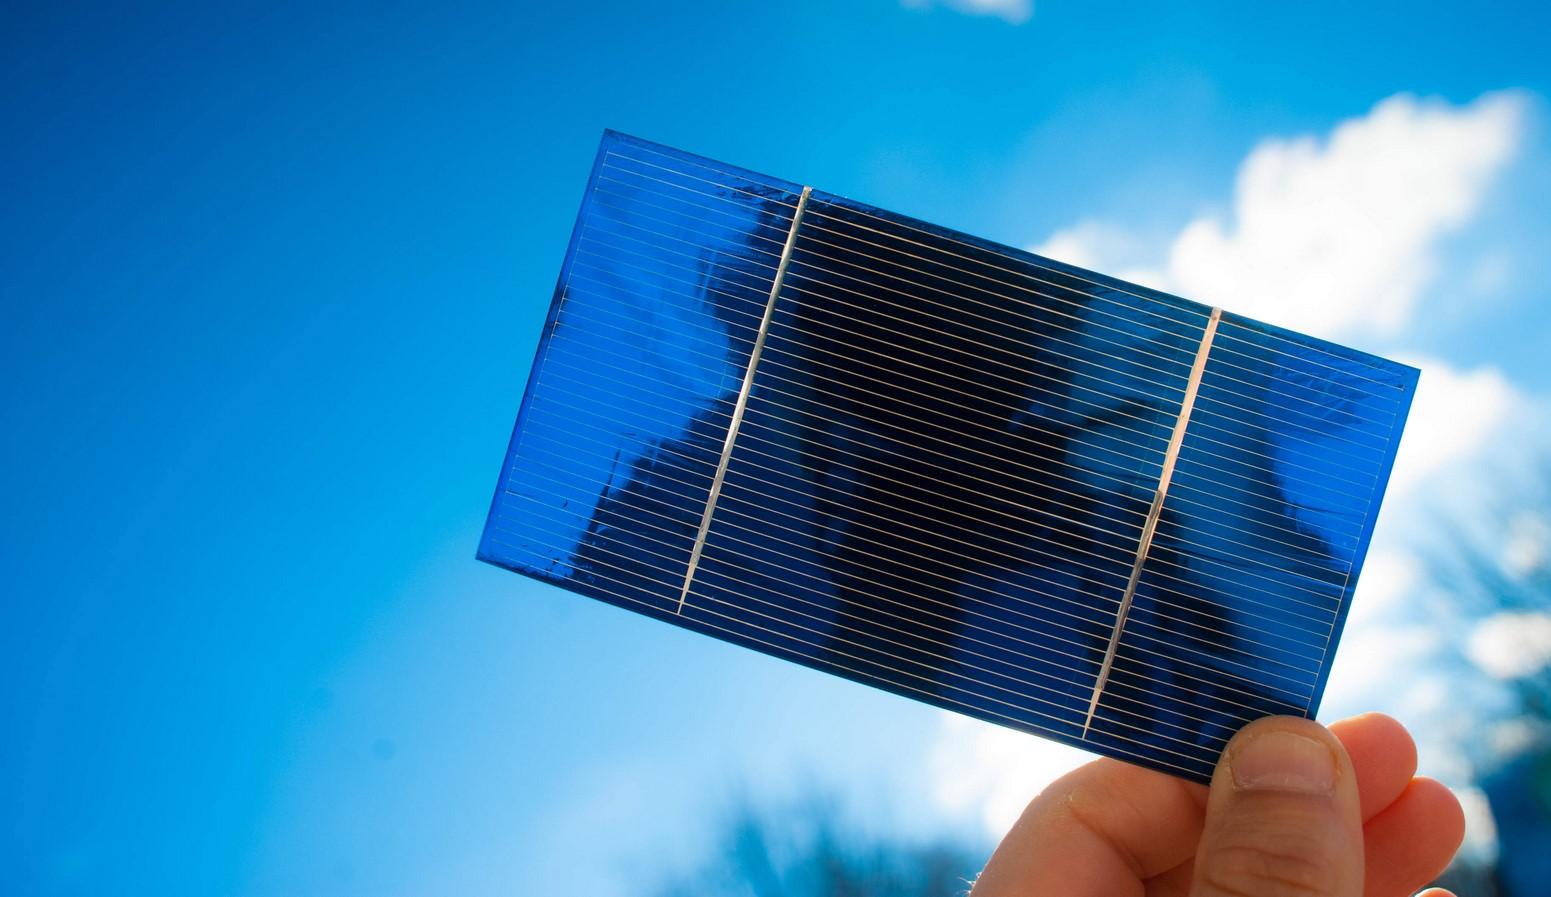 Alternative materials: Photovoltaic cells - sHEET1